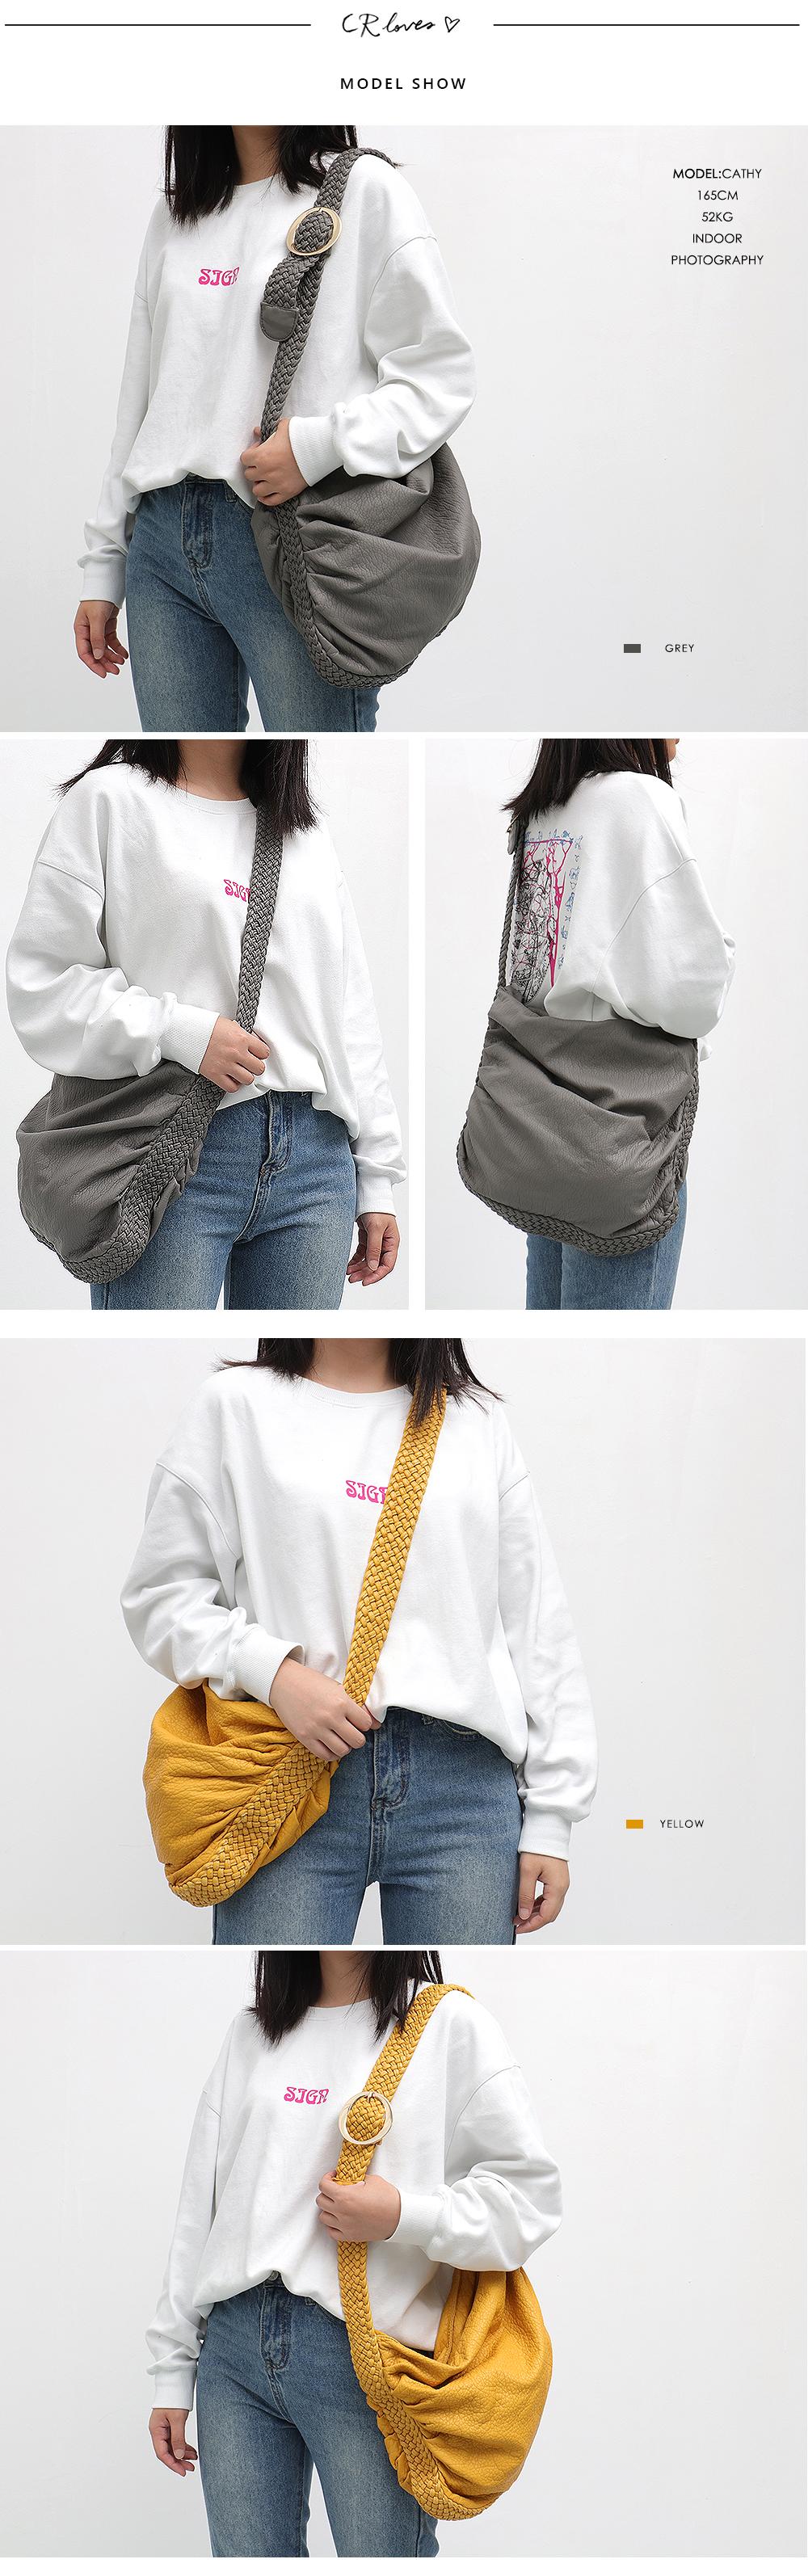 CEZIRA Big Soft Casual Women Bags Girl Wash PU Leather School Handbag Ladies Adjustable Woven Buckle Belt Messenger&Shoulder Bag 4